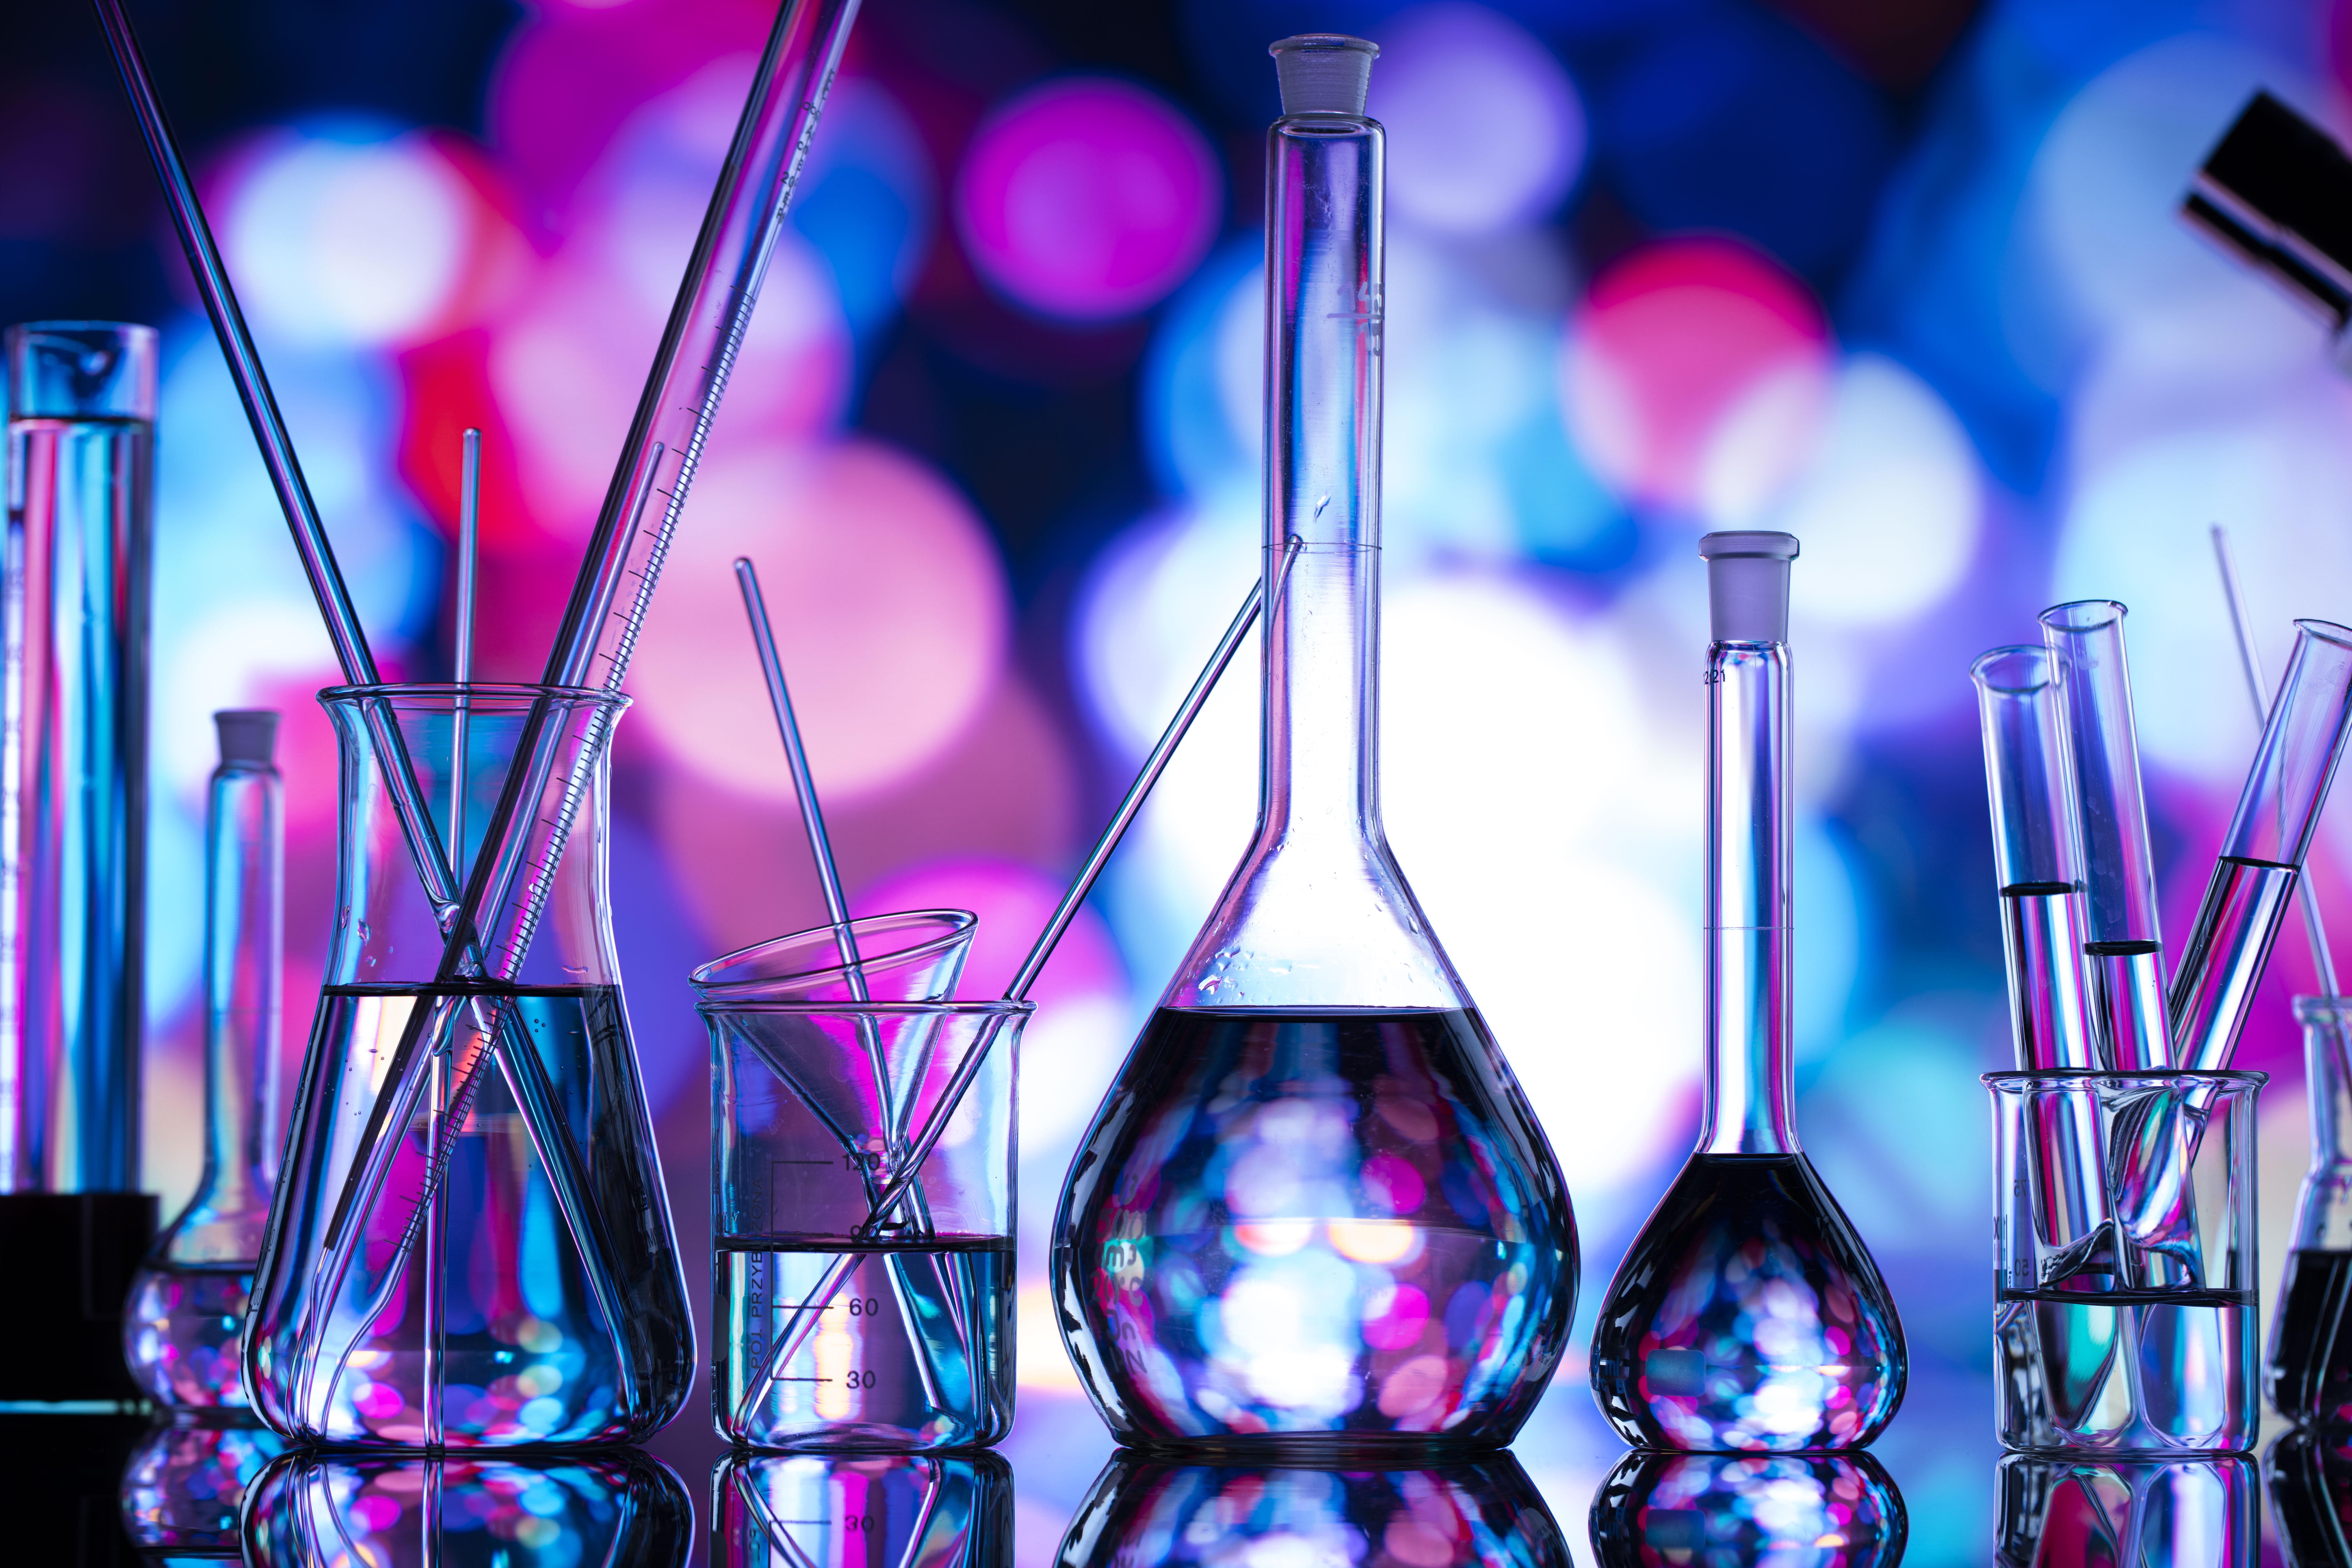 Wallpaper : chemistry, science, laboratories 8688x5792 ...